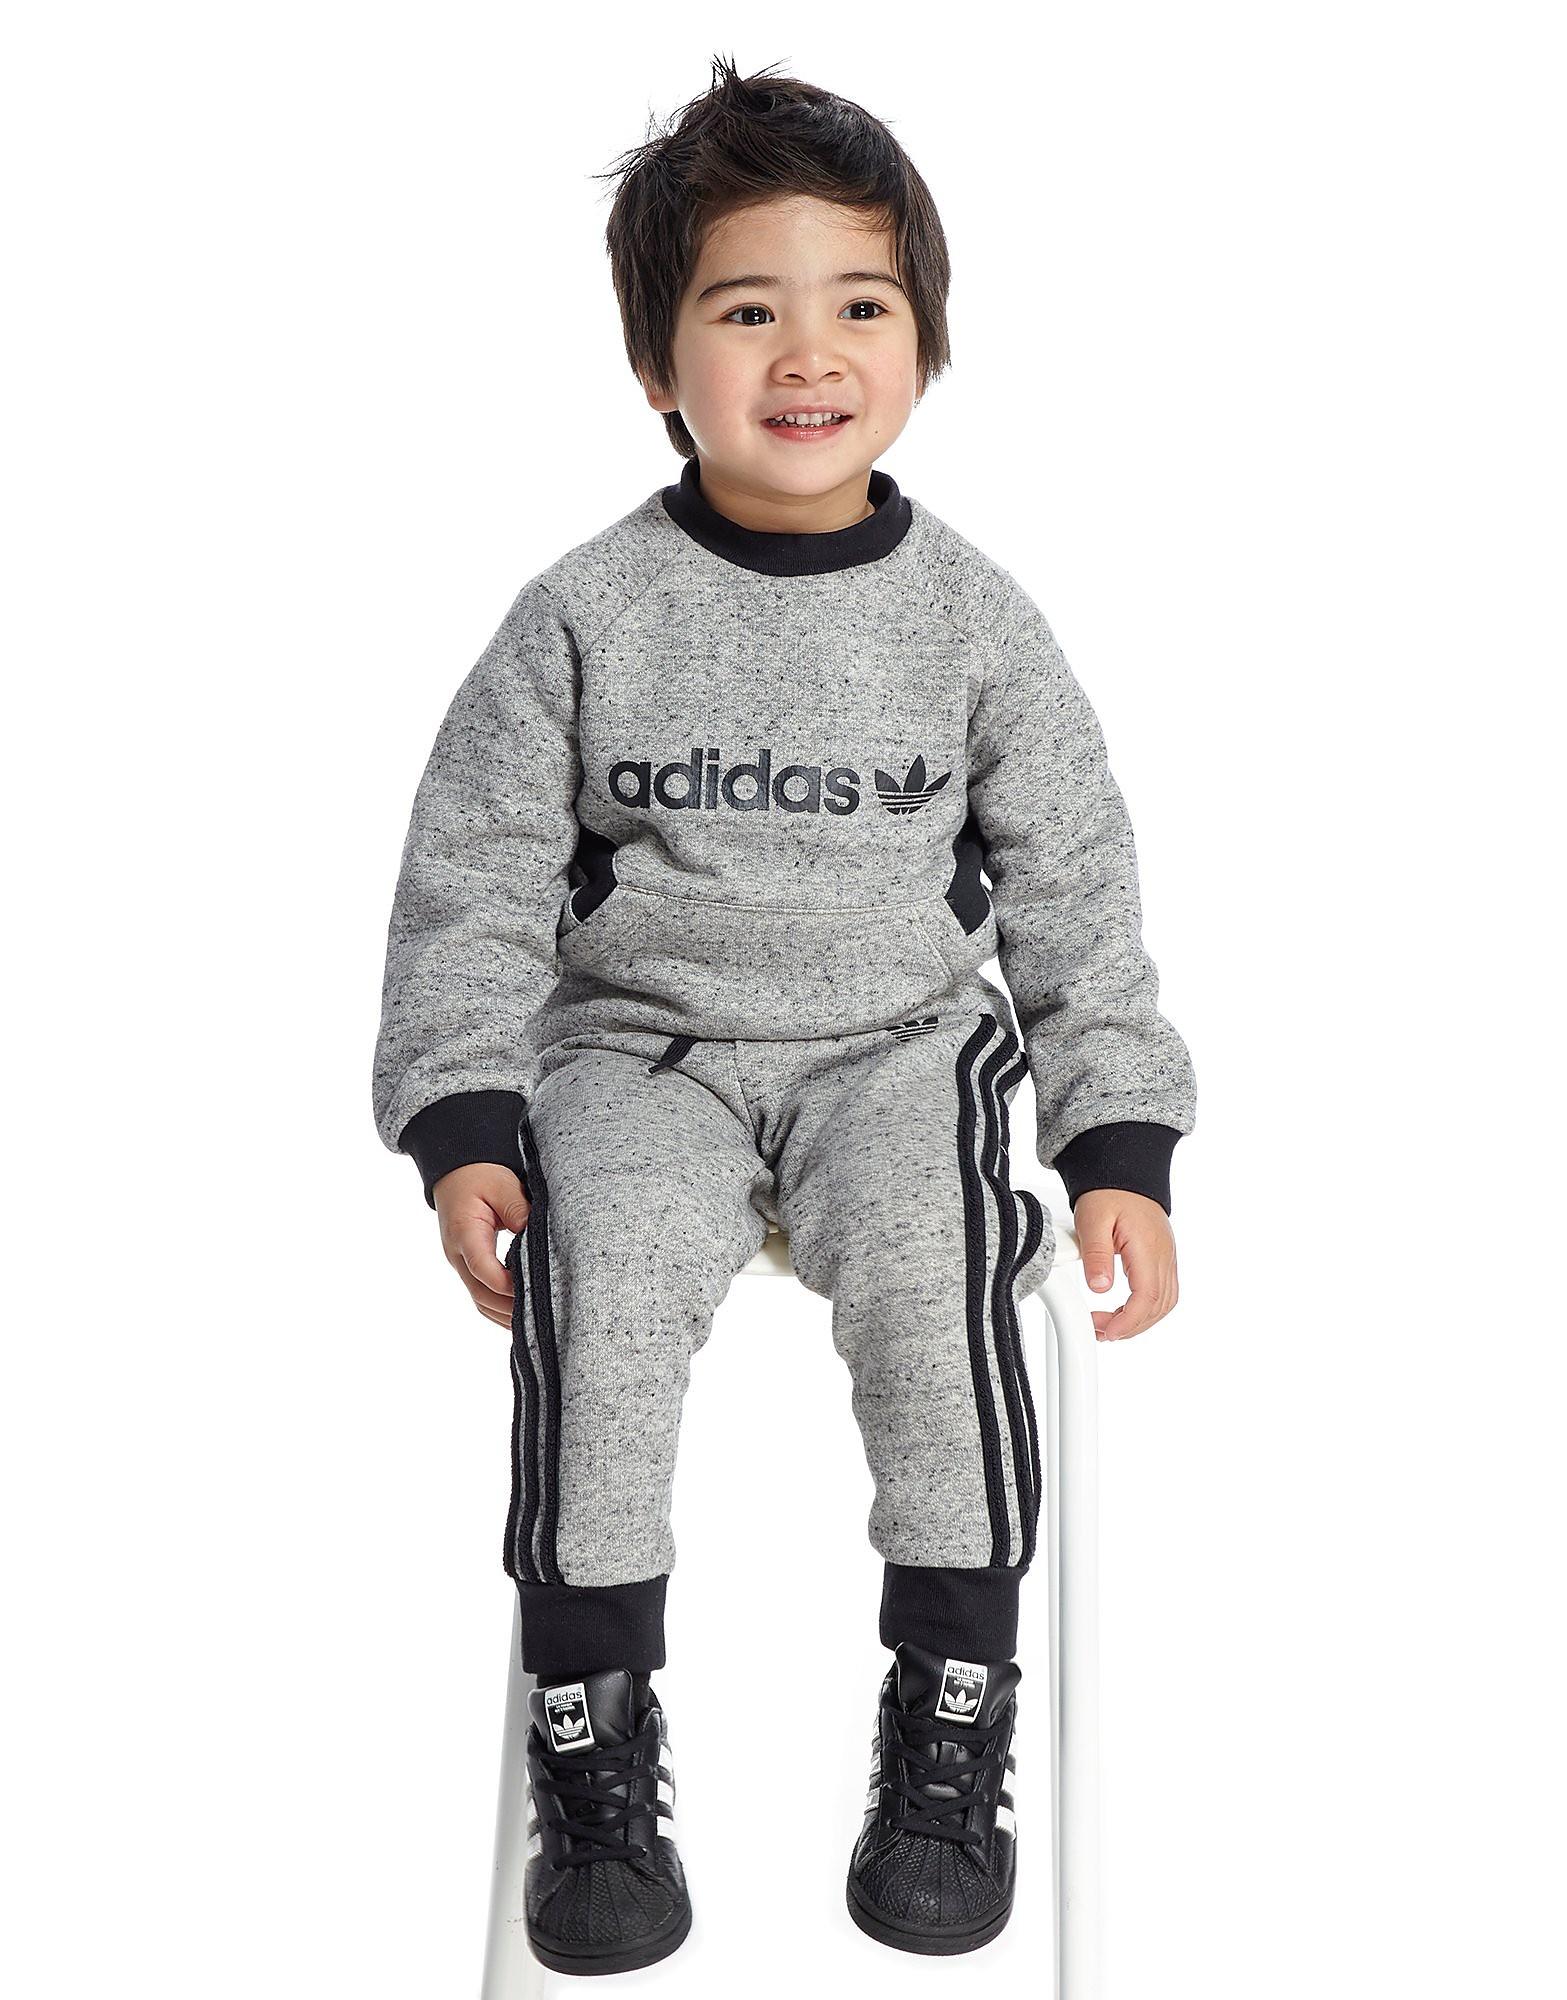 adidas Originals conjunto Trefoil Crew para bebé